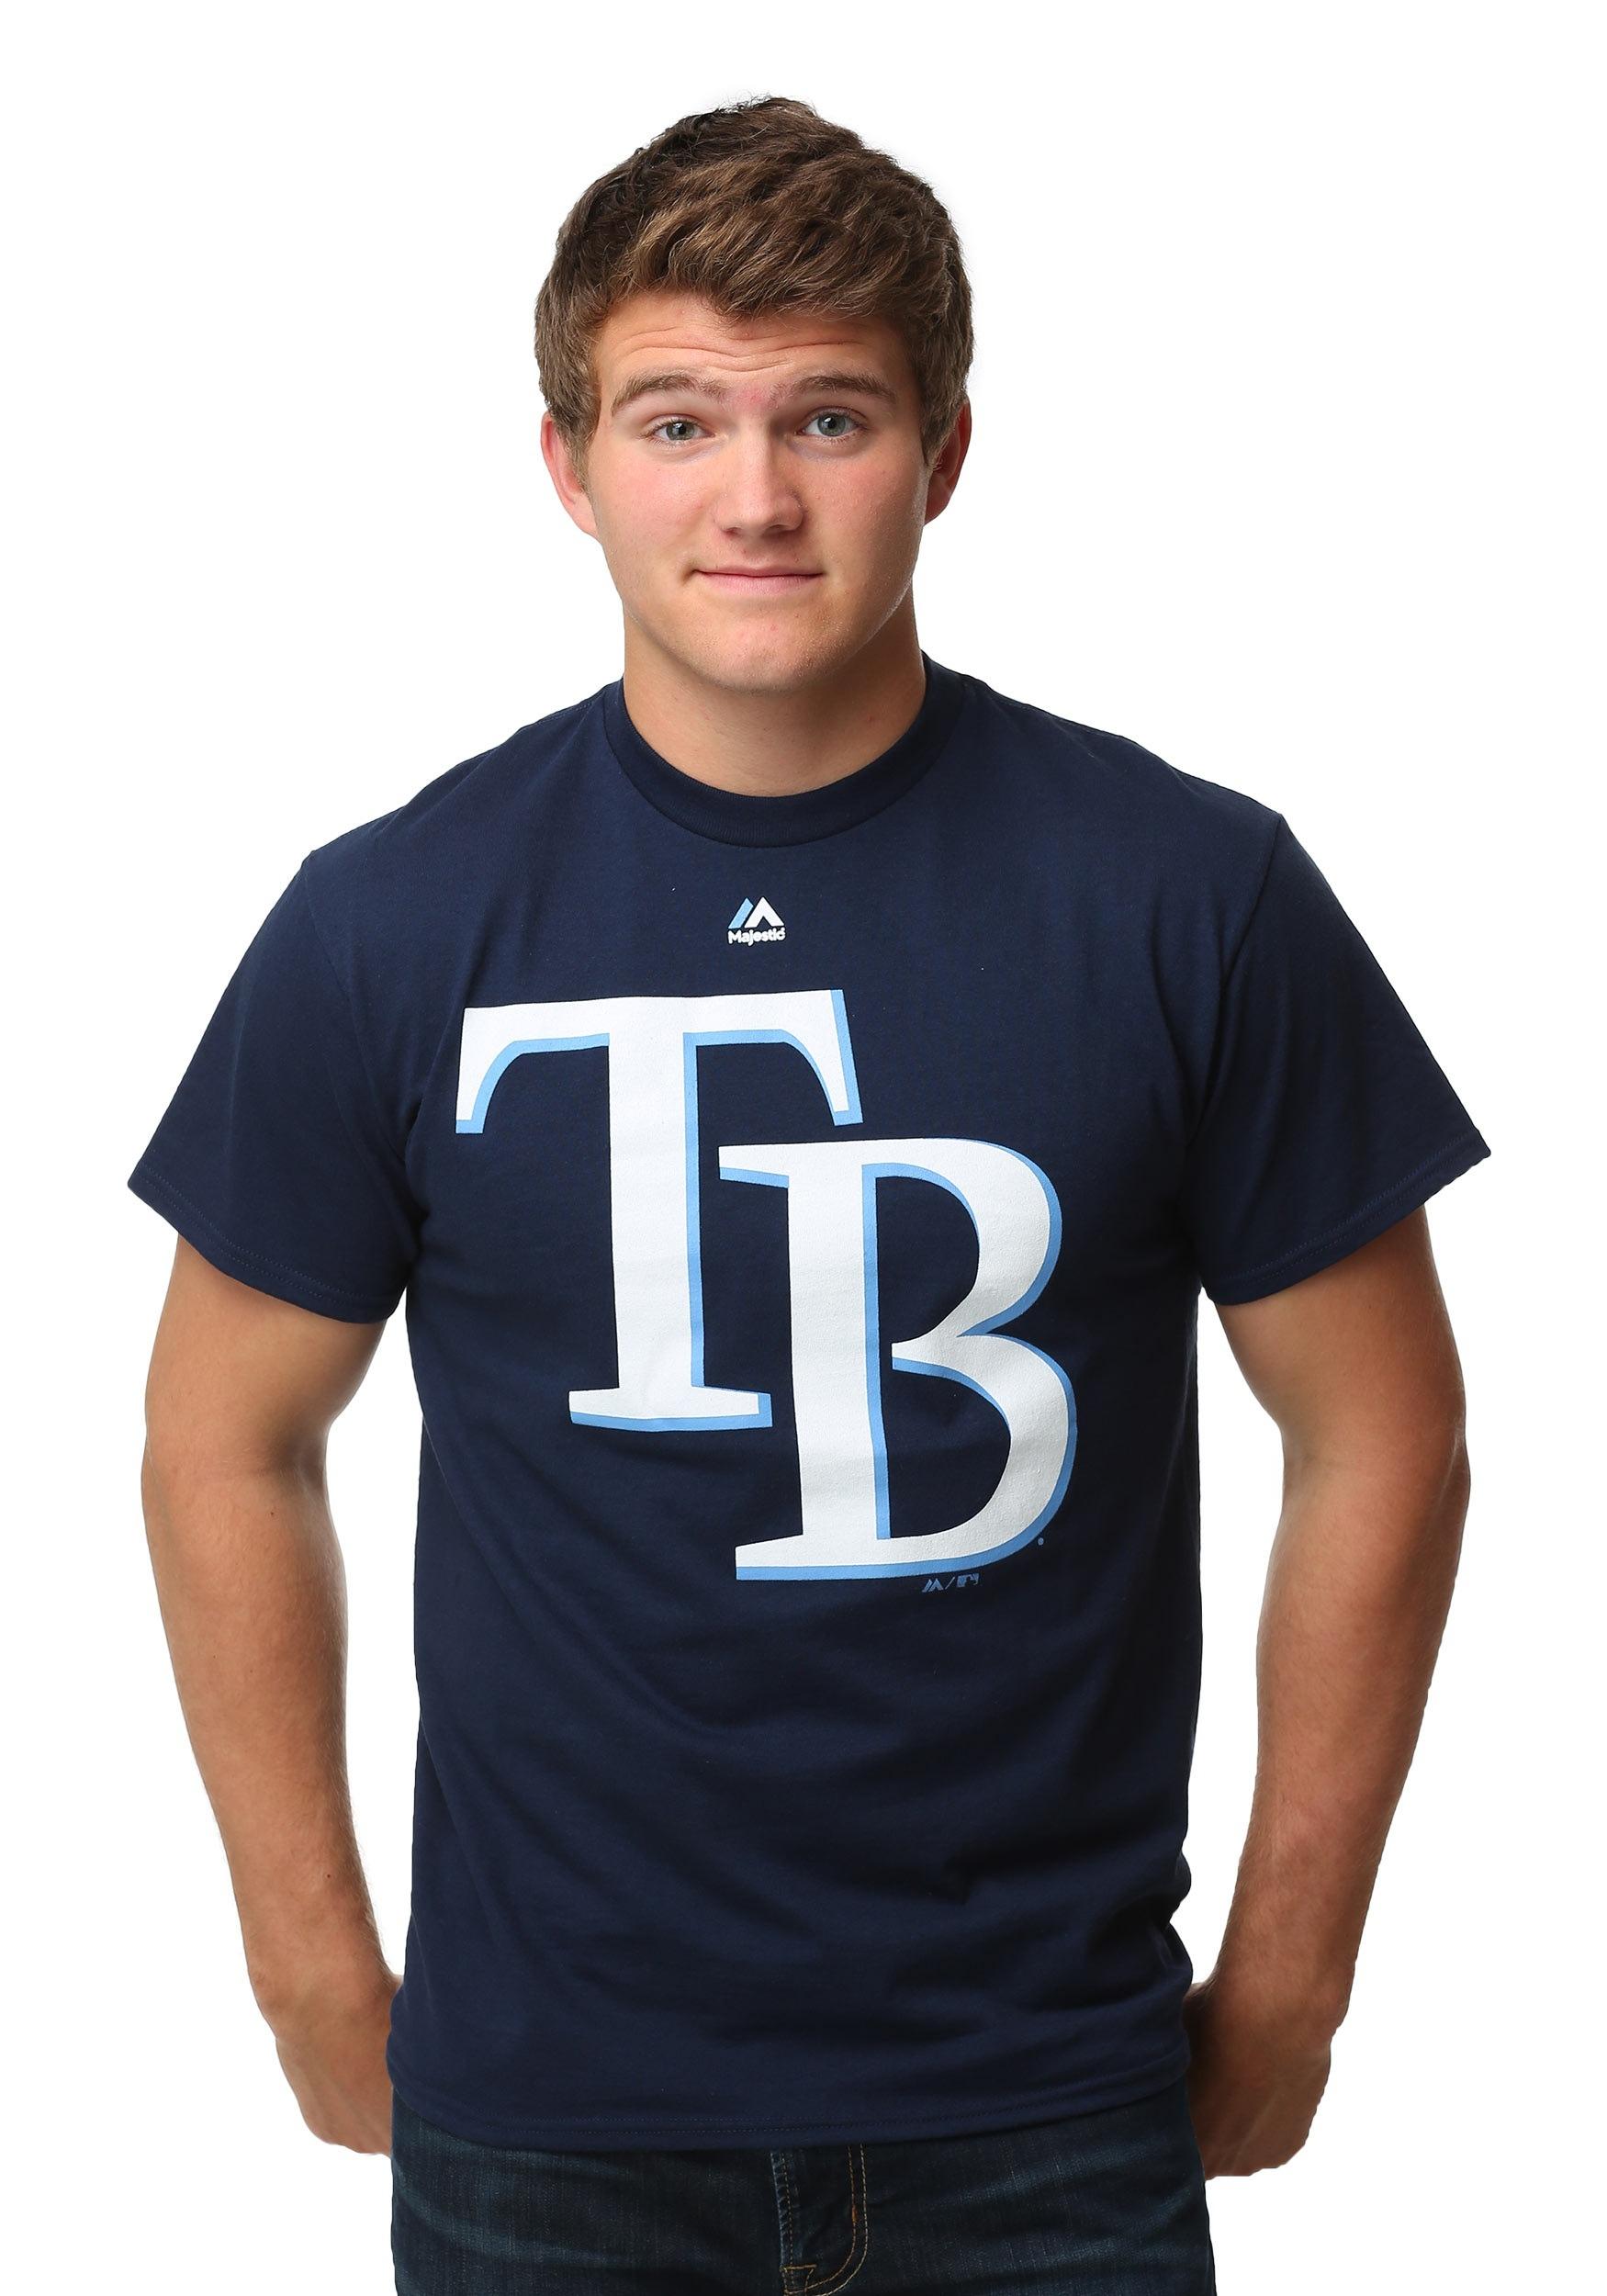 Tampa Bay Rays Official Logo Men's T-Shirt MJM9524506RAYE8C